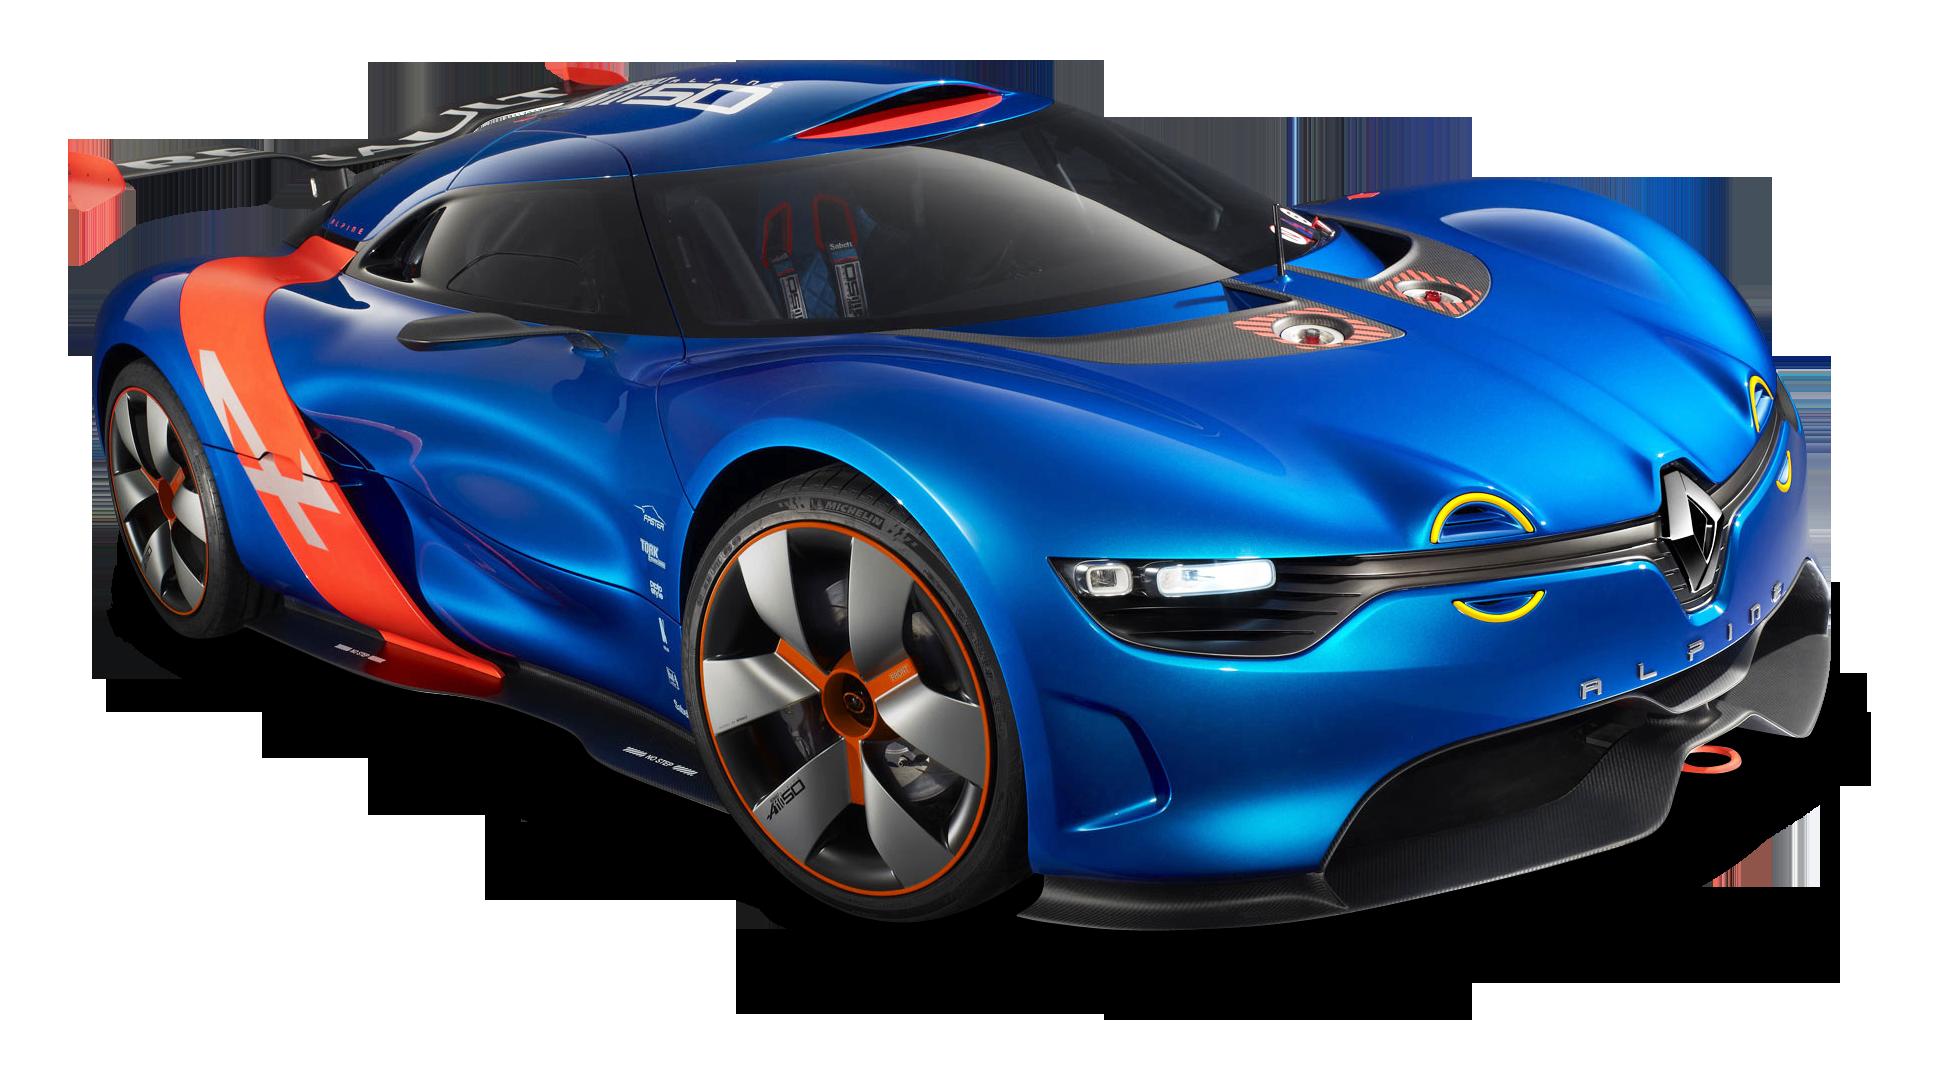 Renault Alpine A110 50 Racing Car PNG Image - Blue Race Car PNG